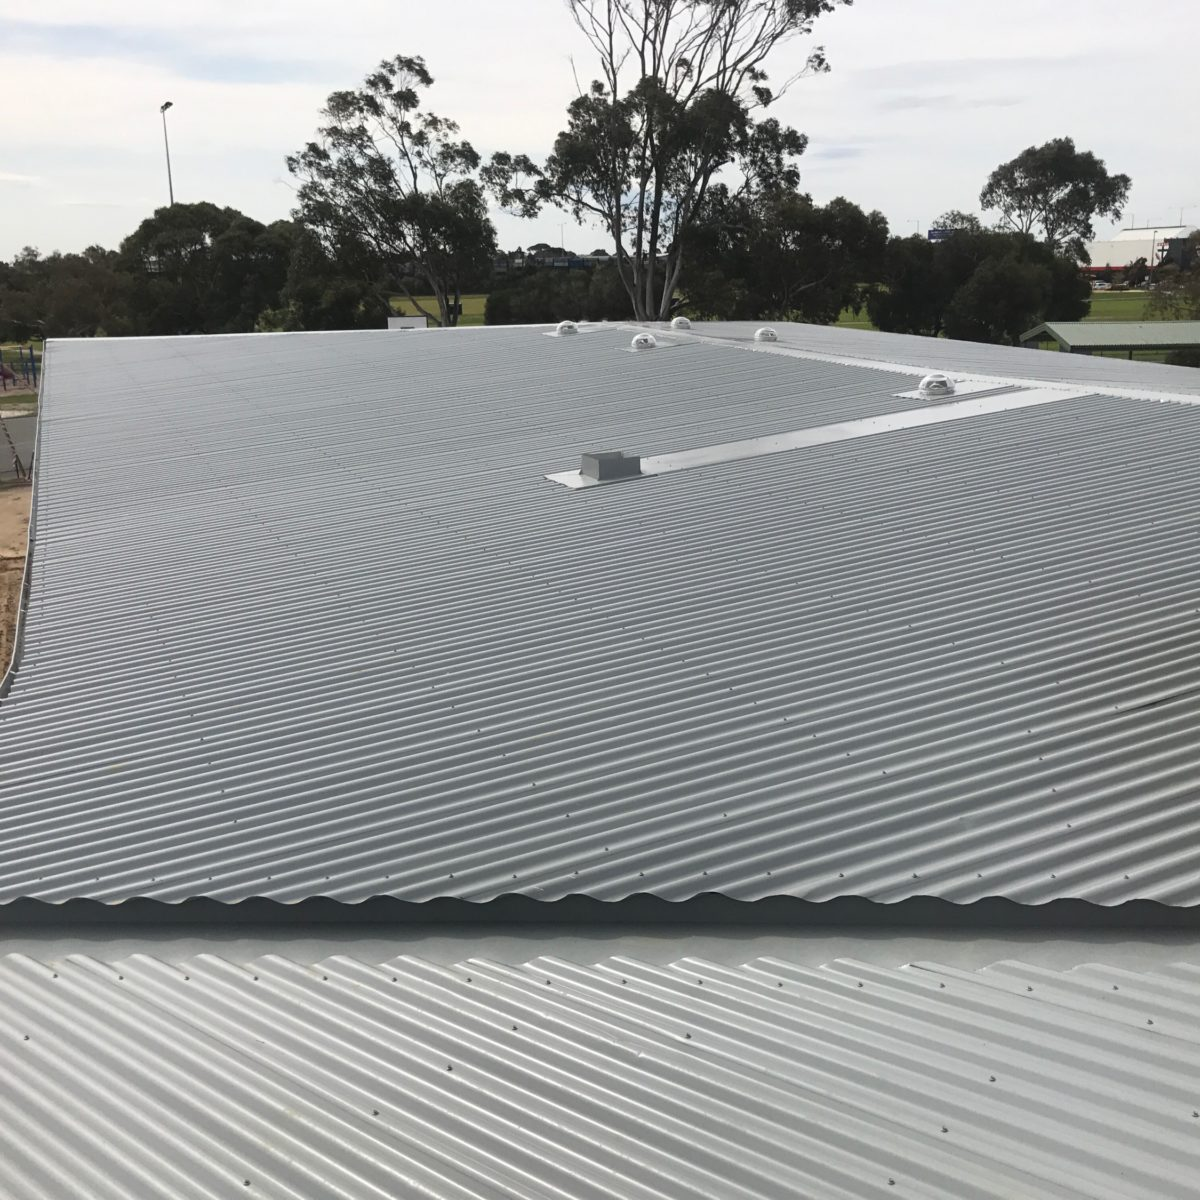 Buckland Roofing roof plumbers installing metal roof on school building